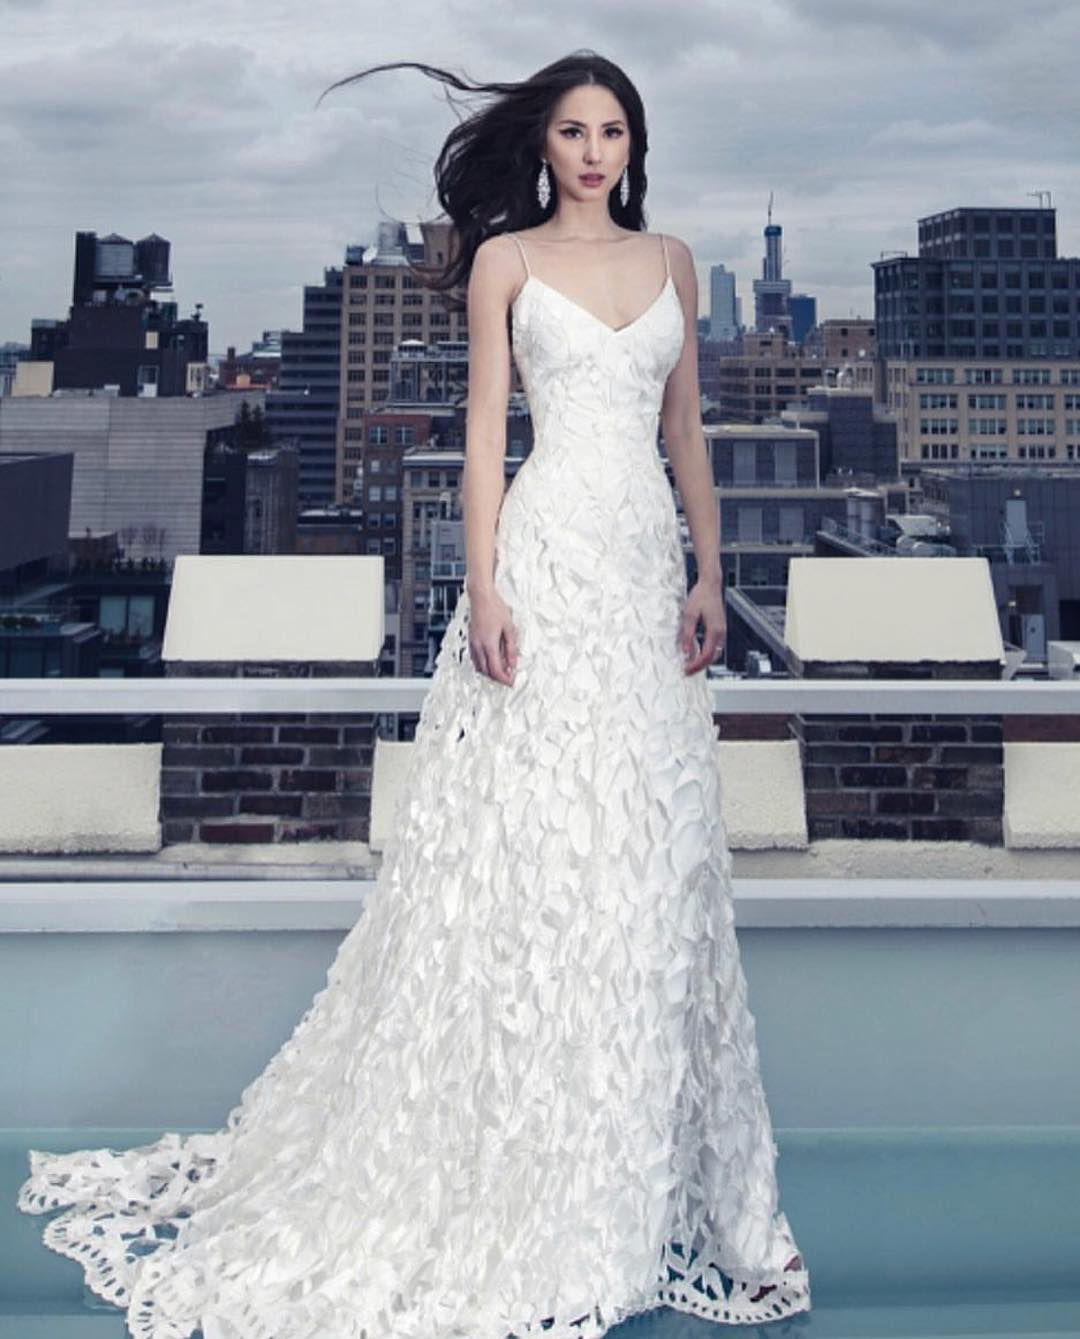 bredice_Beauty_Hair_Extensions_Bridal_fashion_advertising_NYC.jpg